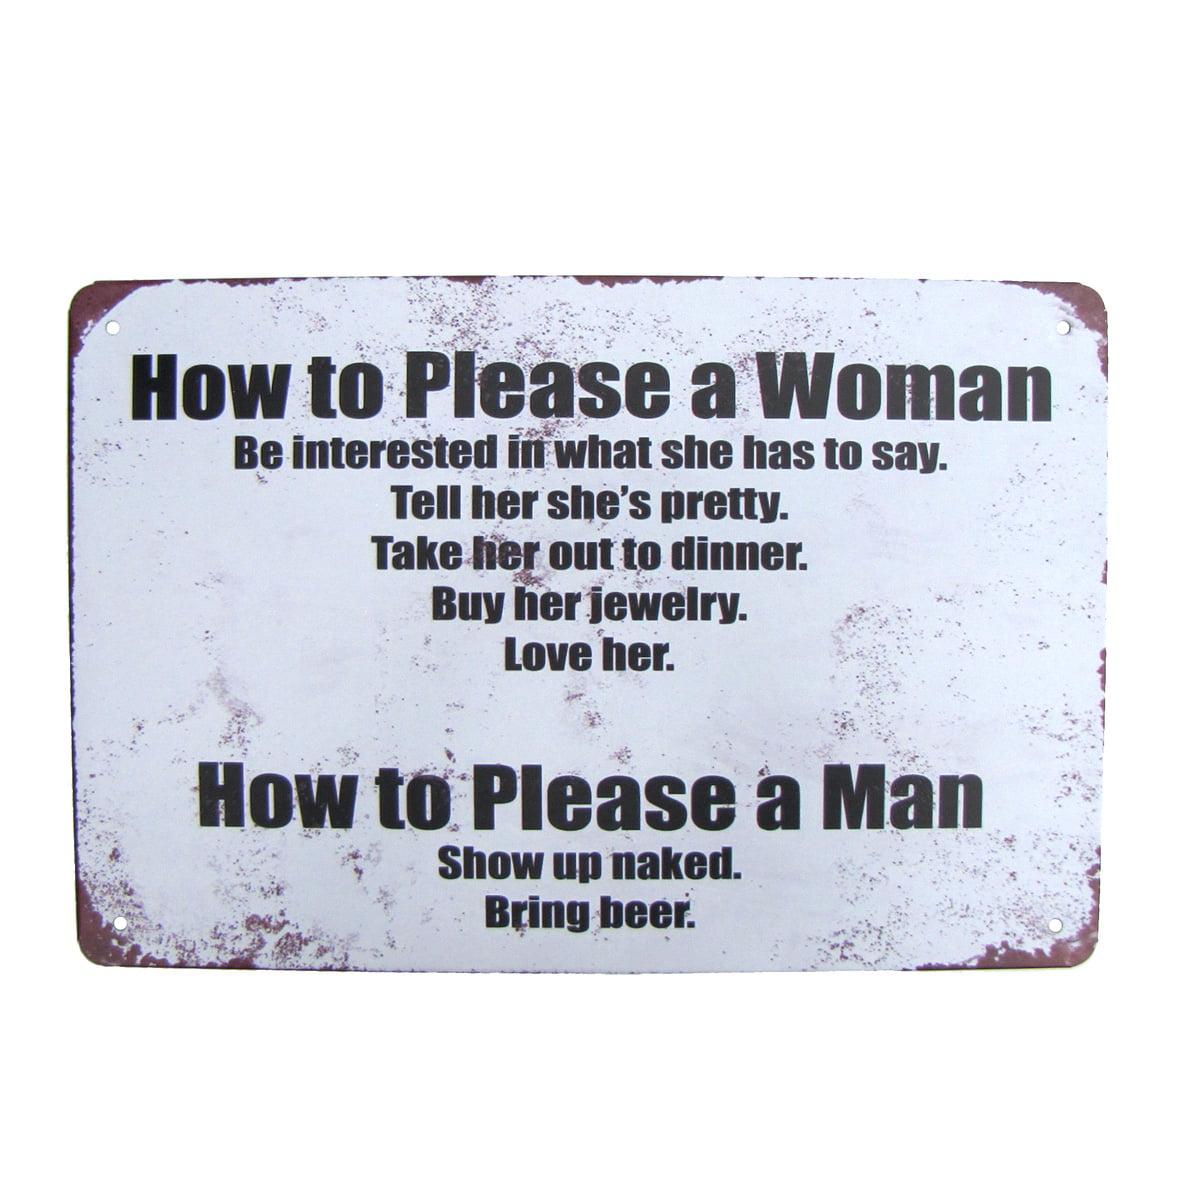 Bar Runner Mat Funny Drink Beer Gifts for Men Women Novelty Home Pub Bar Beer The Reason